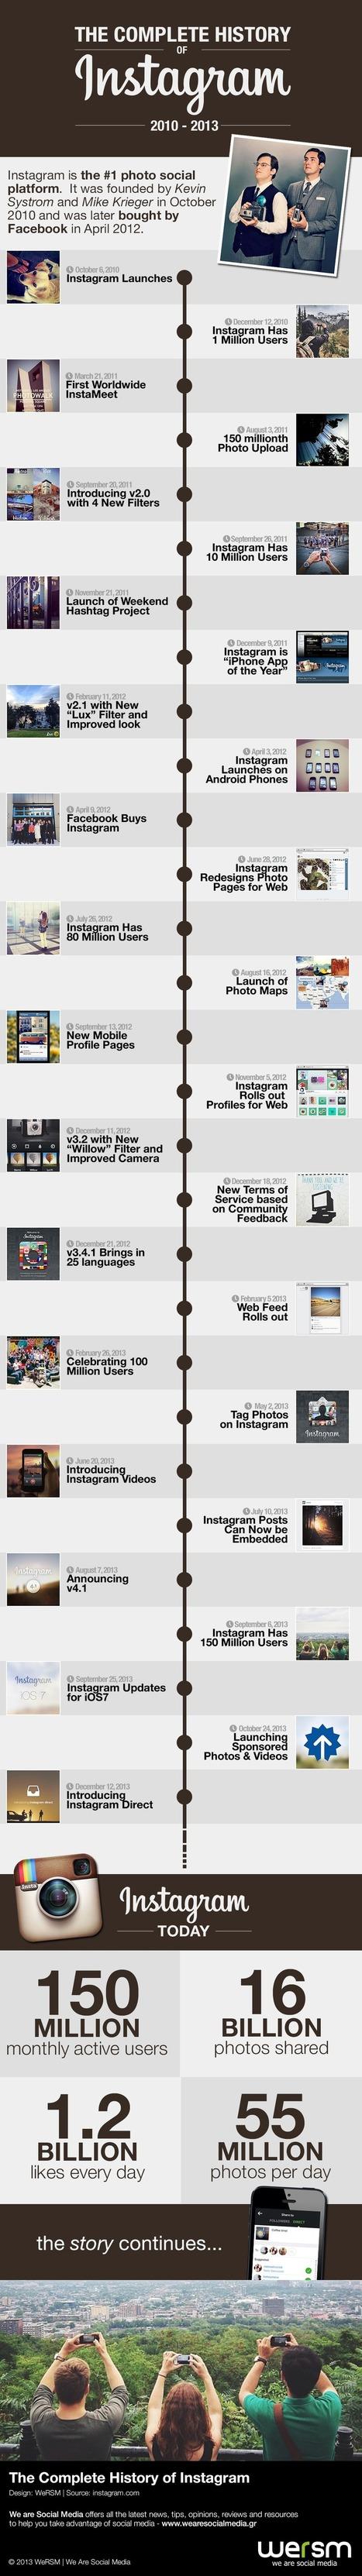 La historia completa de Instagram #infografia #infographic #socialmedia | communitymanagerspain | Scoop.it